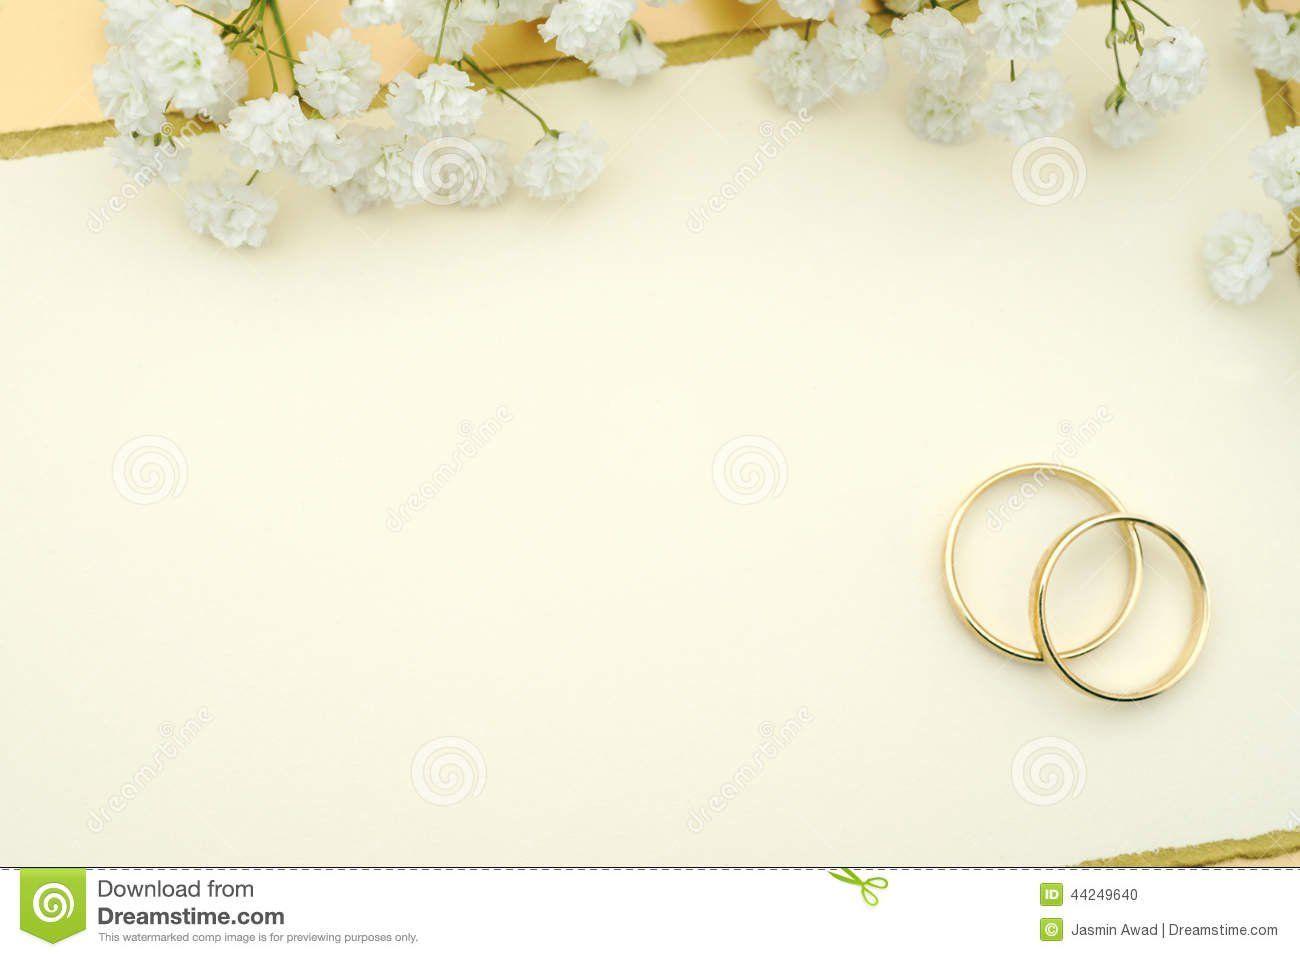 Pin By Shaza Alter On عرس In 2020 Blank Wedding Invitations